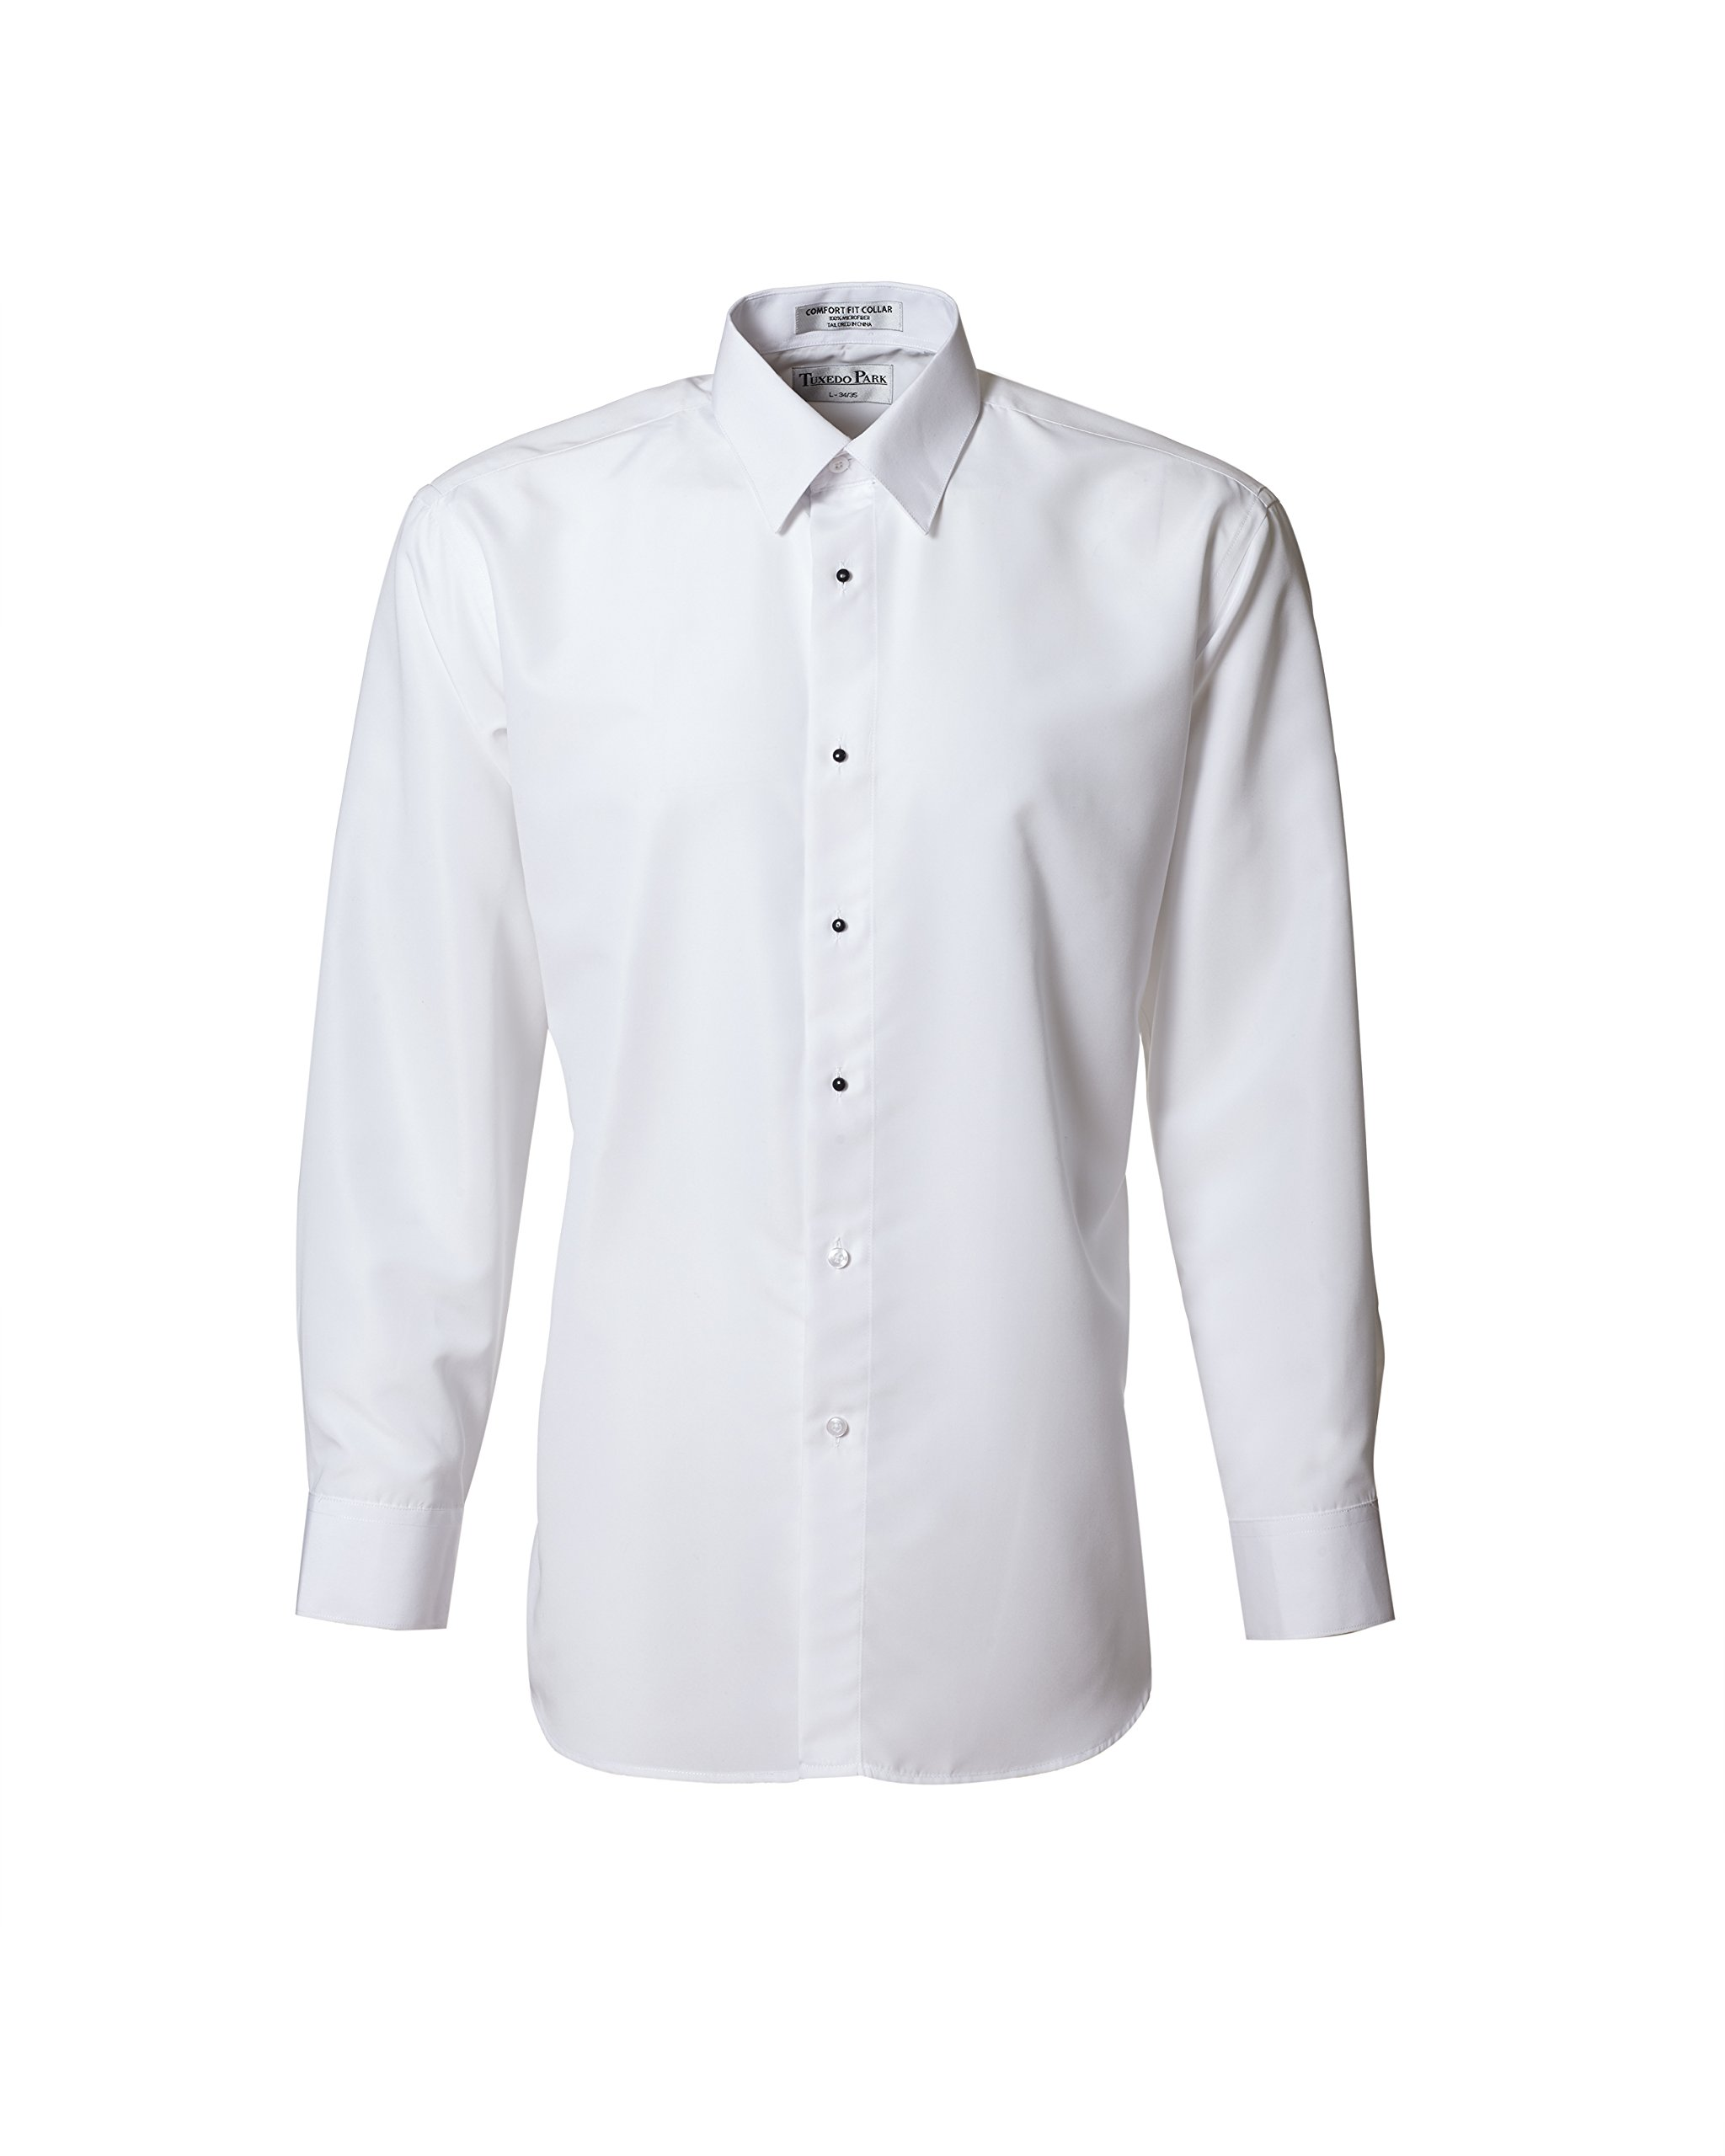 White Microfiber Non Pleated Standard Collar Tuxedo Shirt by Tuxedo Park